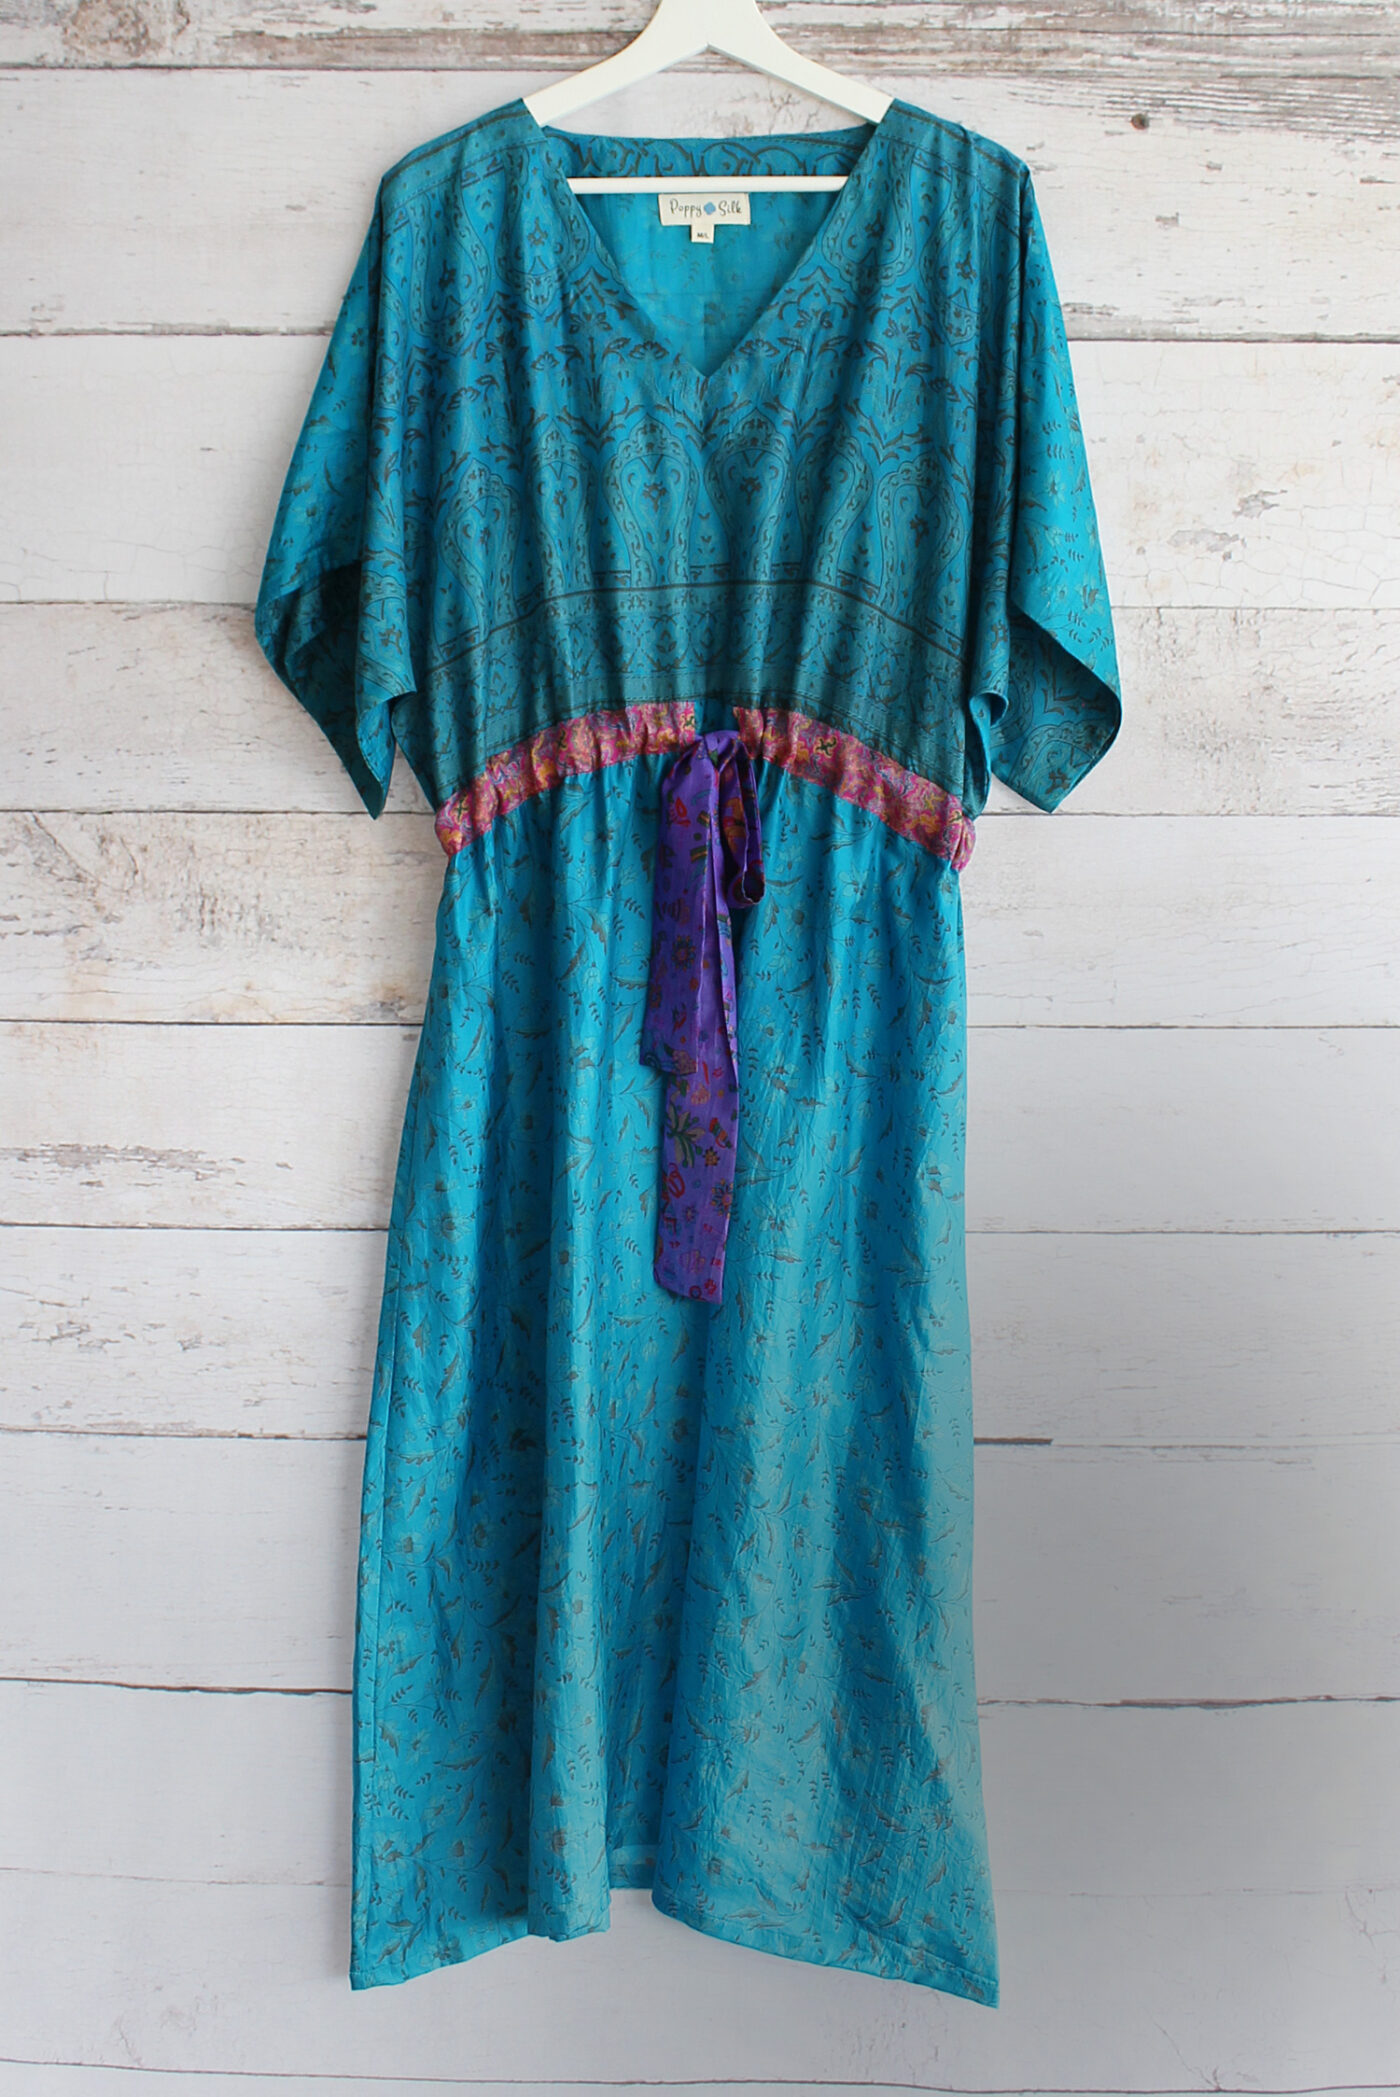 Jacinda Recycled Silk Sari Print Dress J34